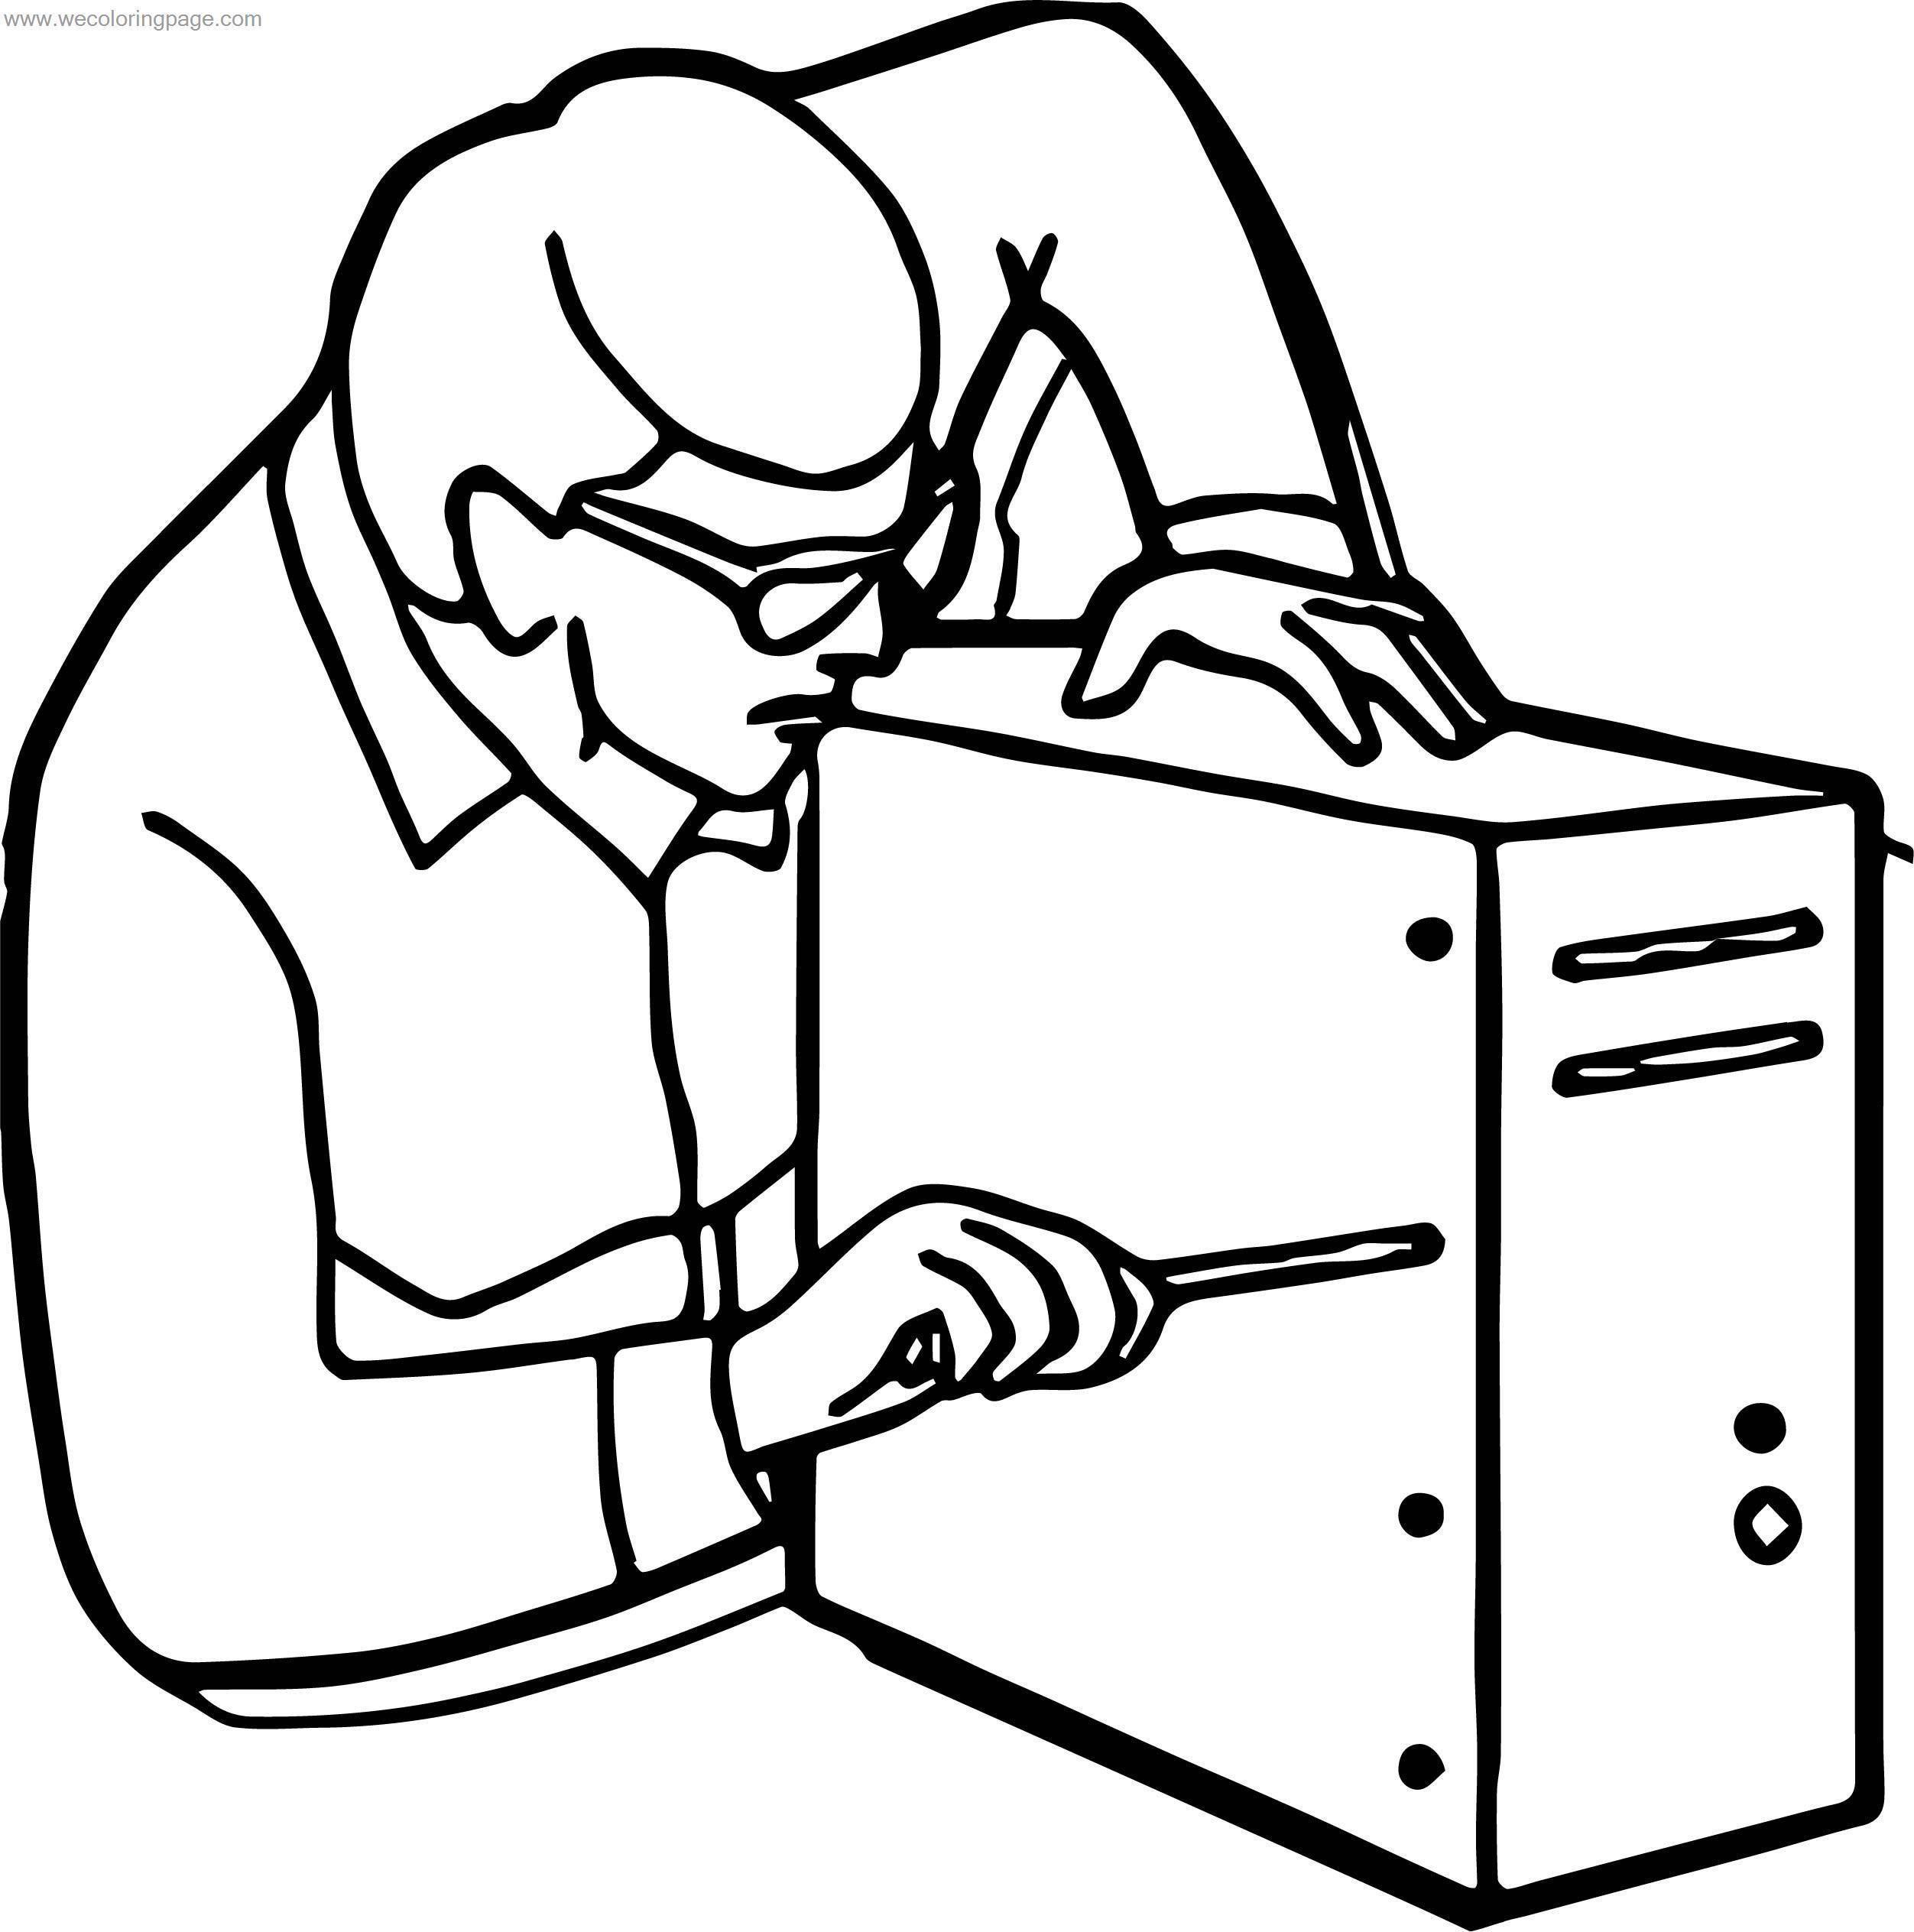 repair computer engineer coloring page